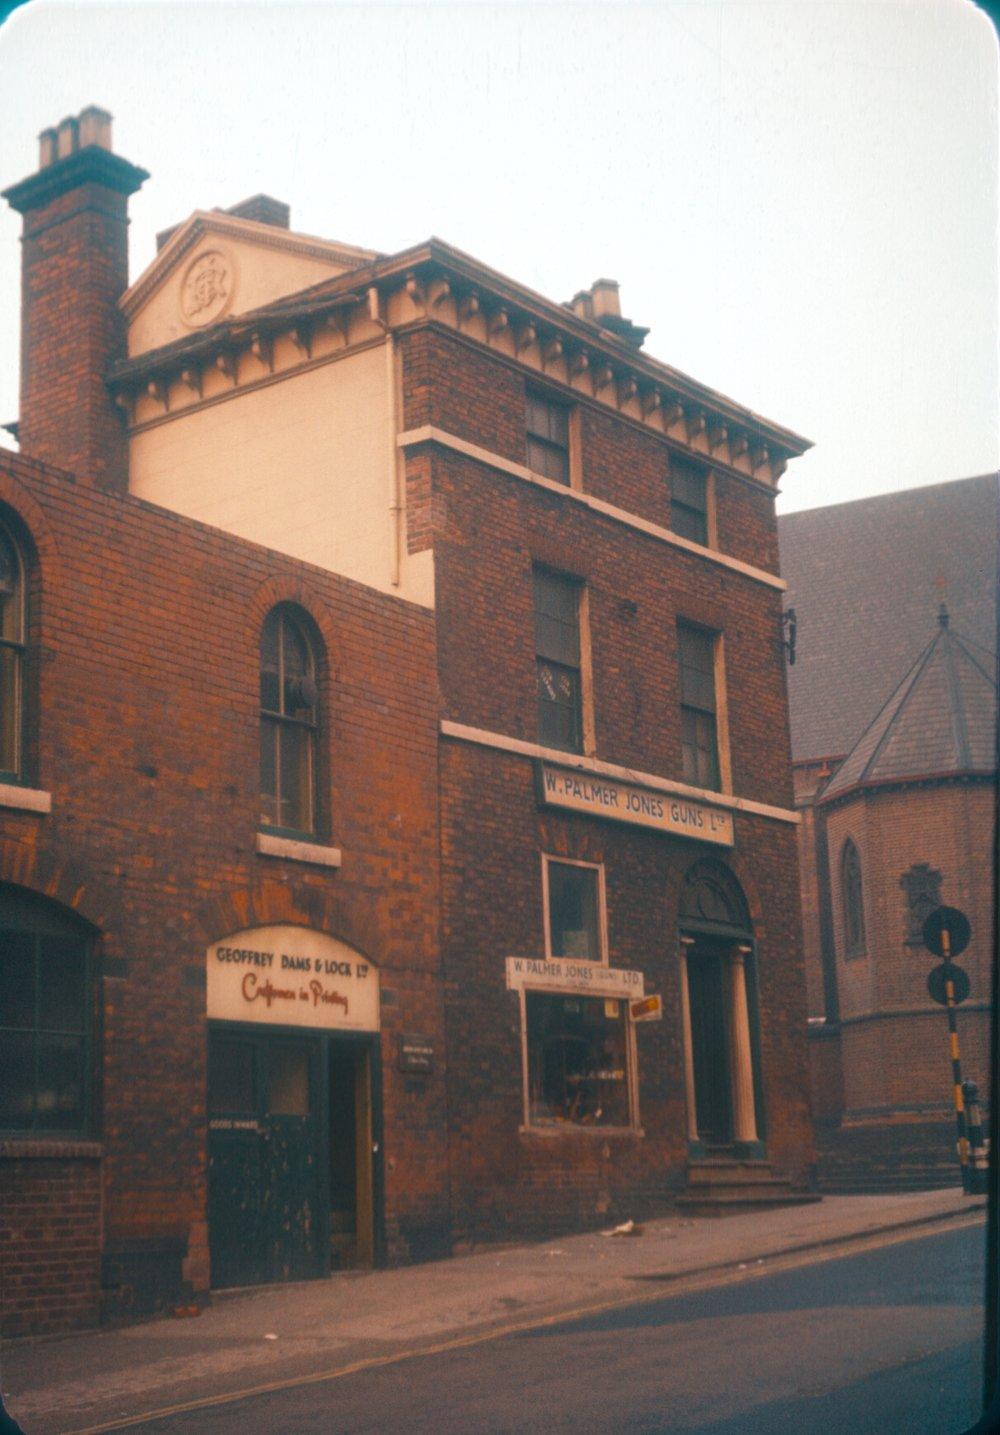 Gun Quarter Bath Street, Shadwell Street Corner. W. Palmer Jones Guns Ltd. By St. Chads Roman Catholic Cathedral. 25th March 1960